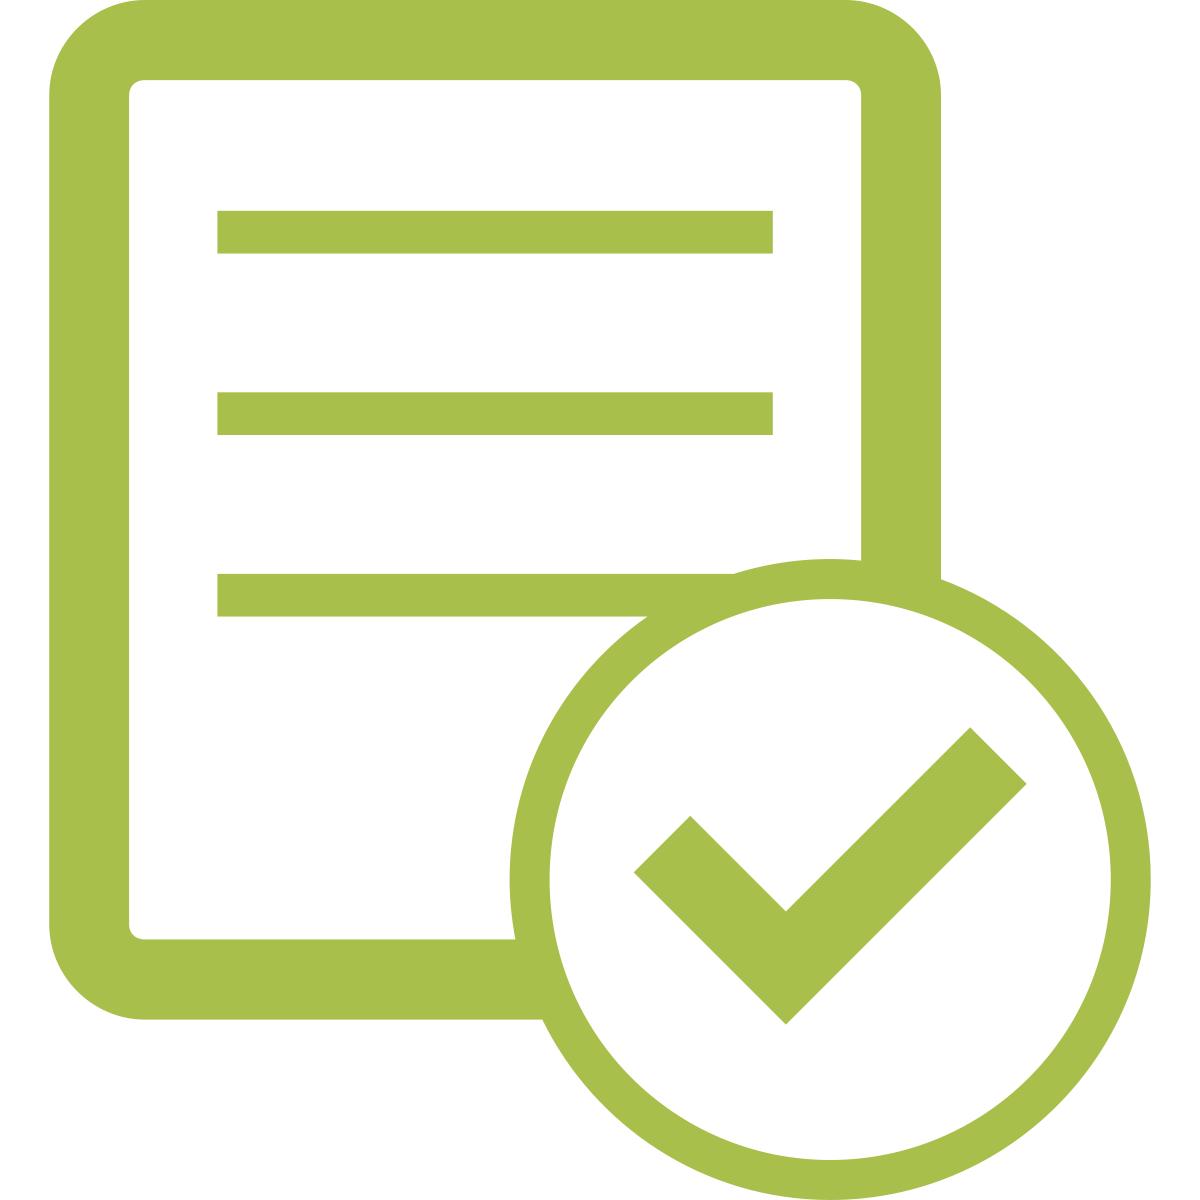 Penetration Testing Checklist Icon